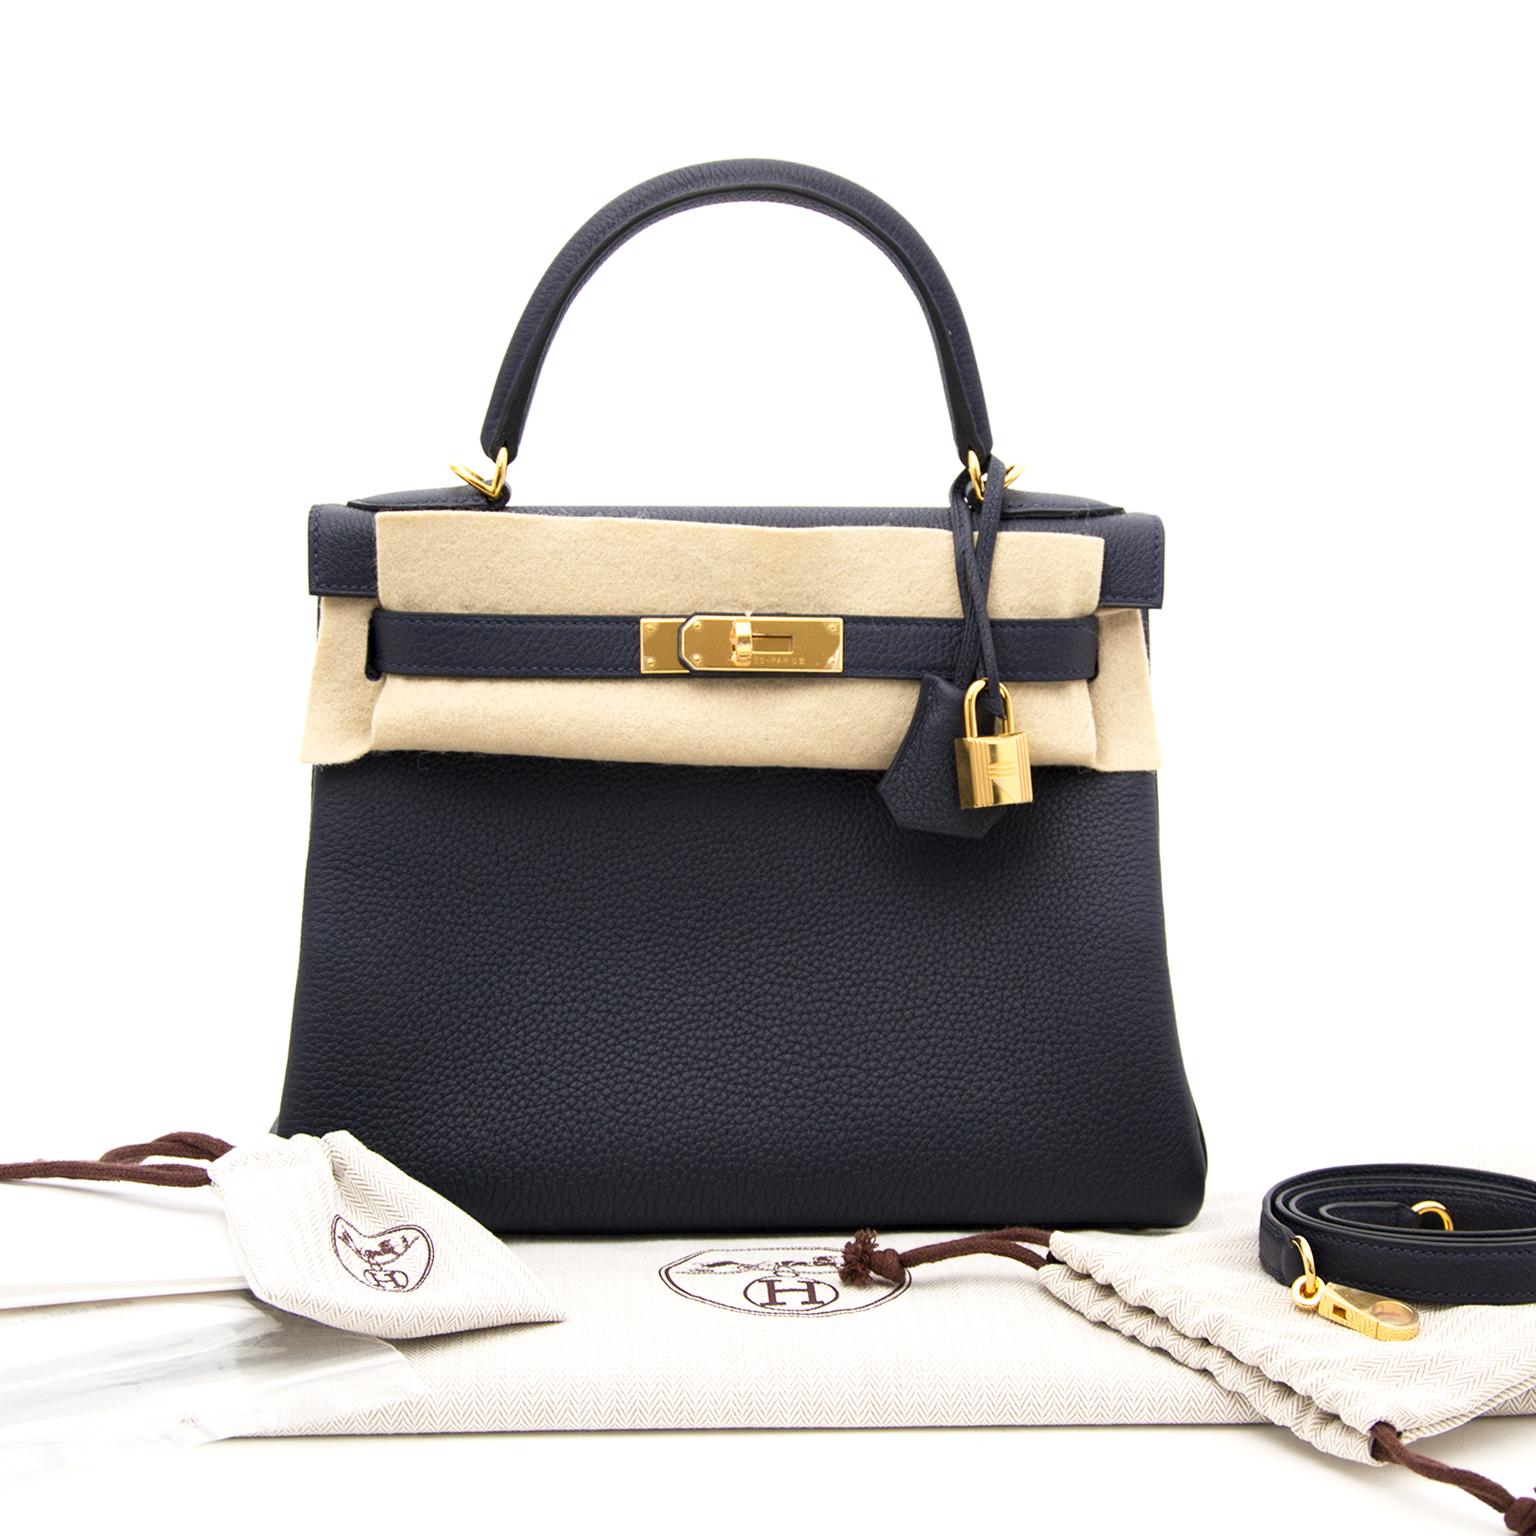 3e3c49e9de Labellov Buy safe Delvaux designer vintage online. Vind tweedehands ...